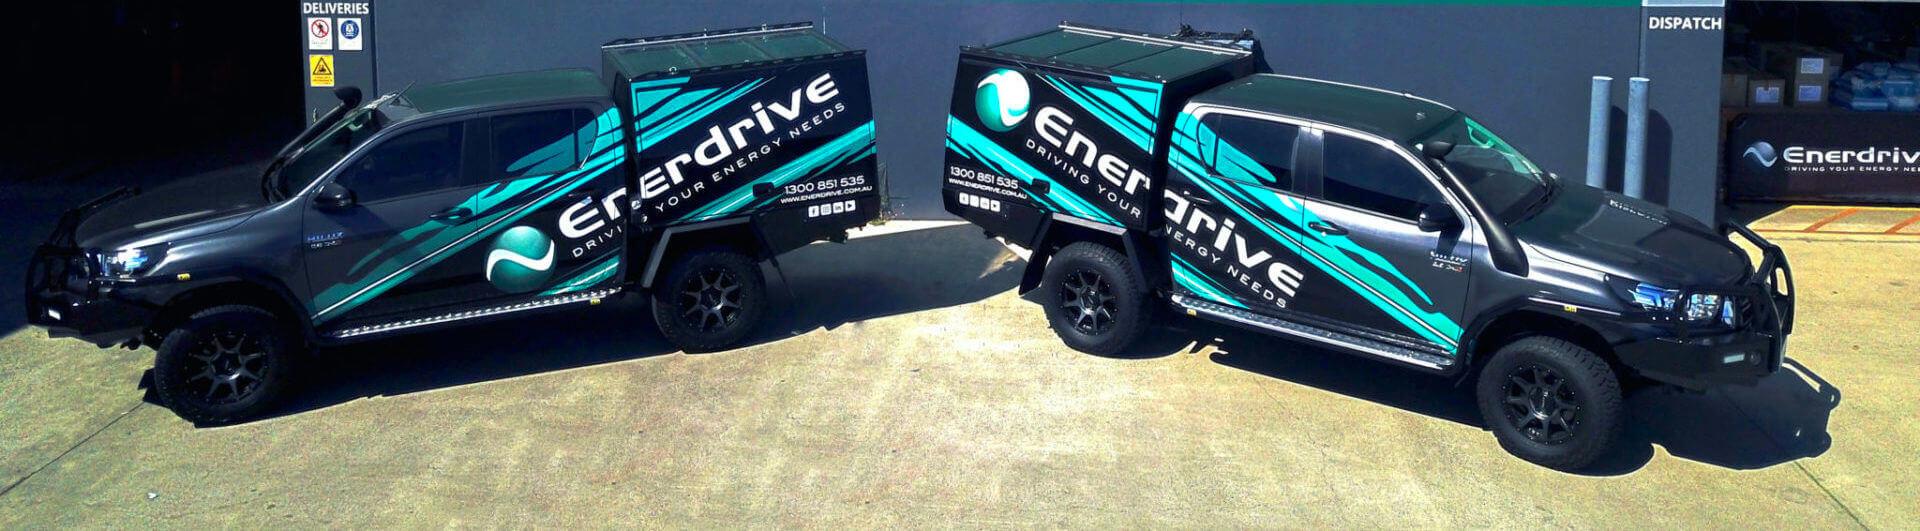 photo of Enerdrive Branded Vehicles